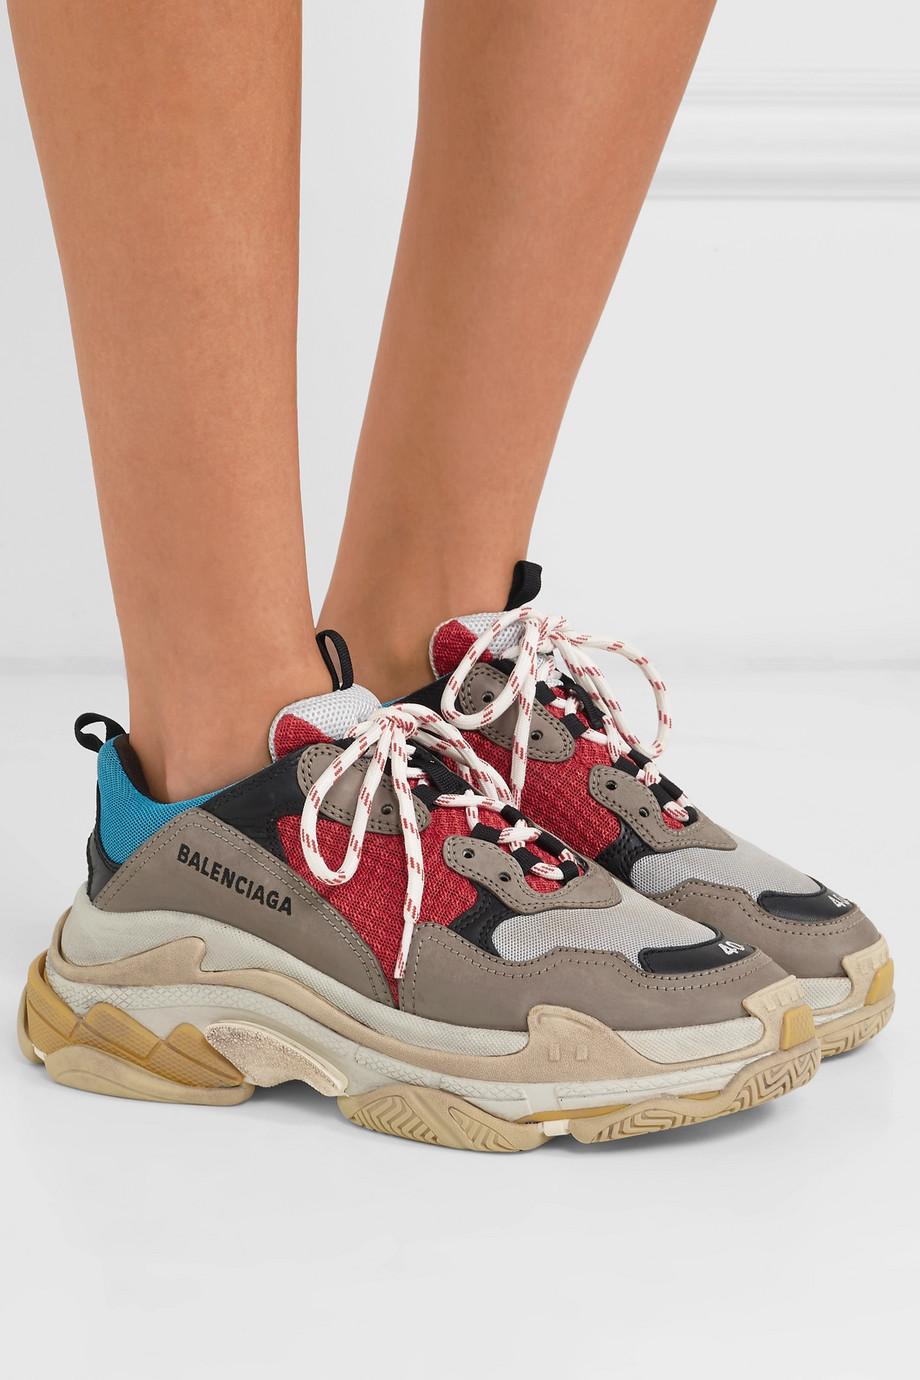 Balenciaga Triple S 标志刺绣皮革牛巴革网眼运动鞋